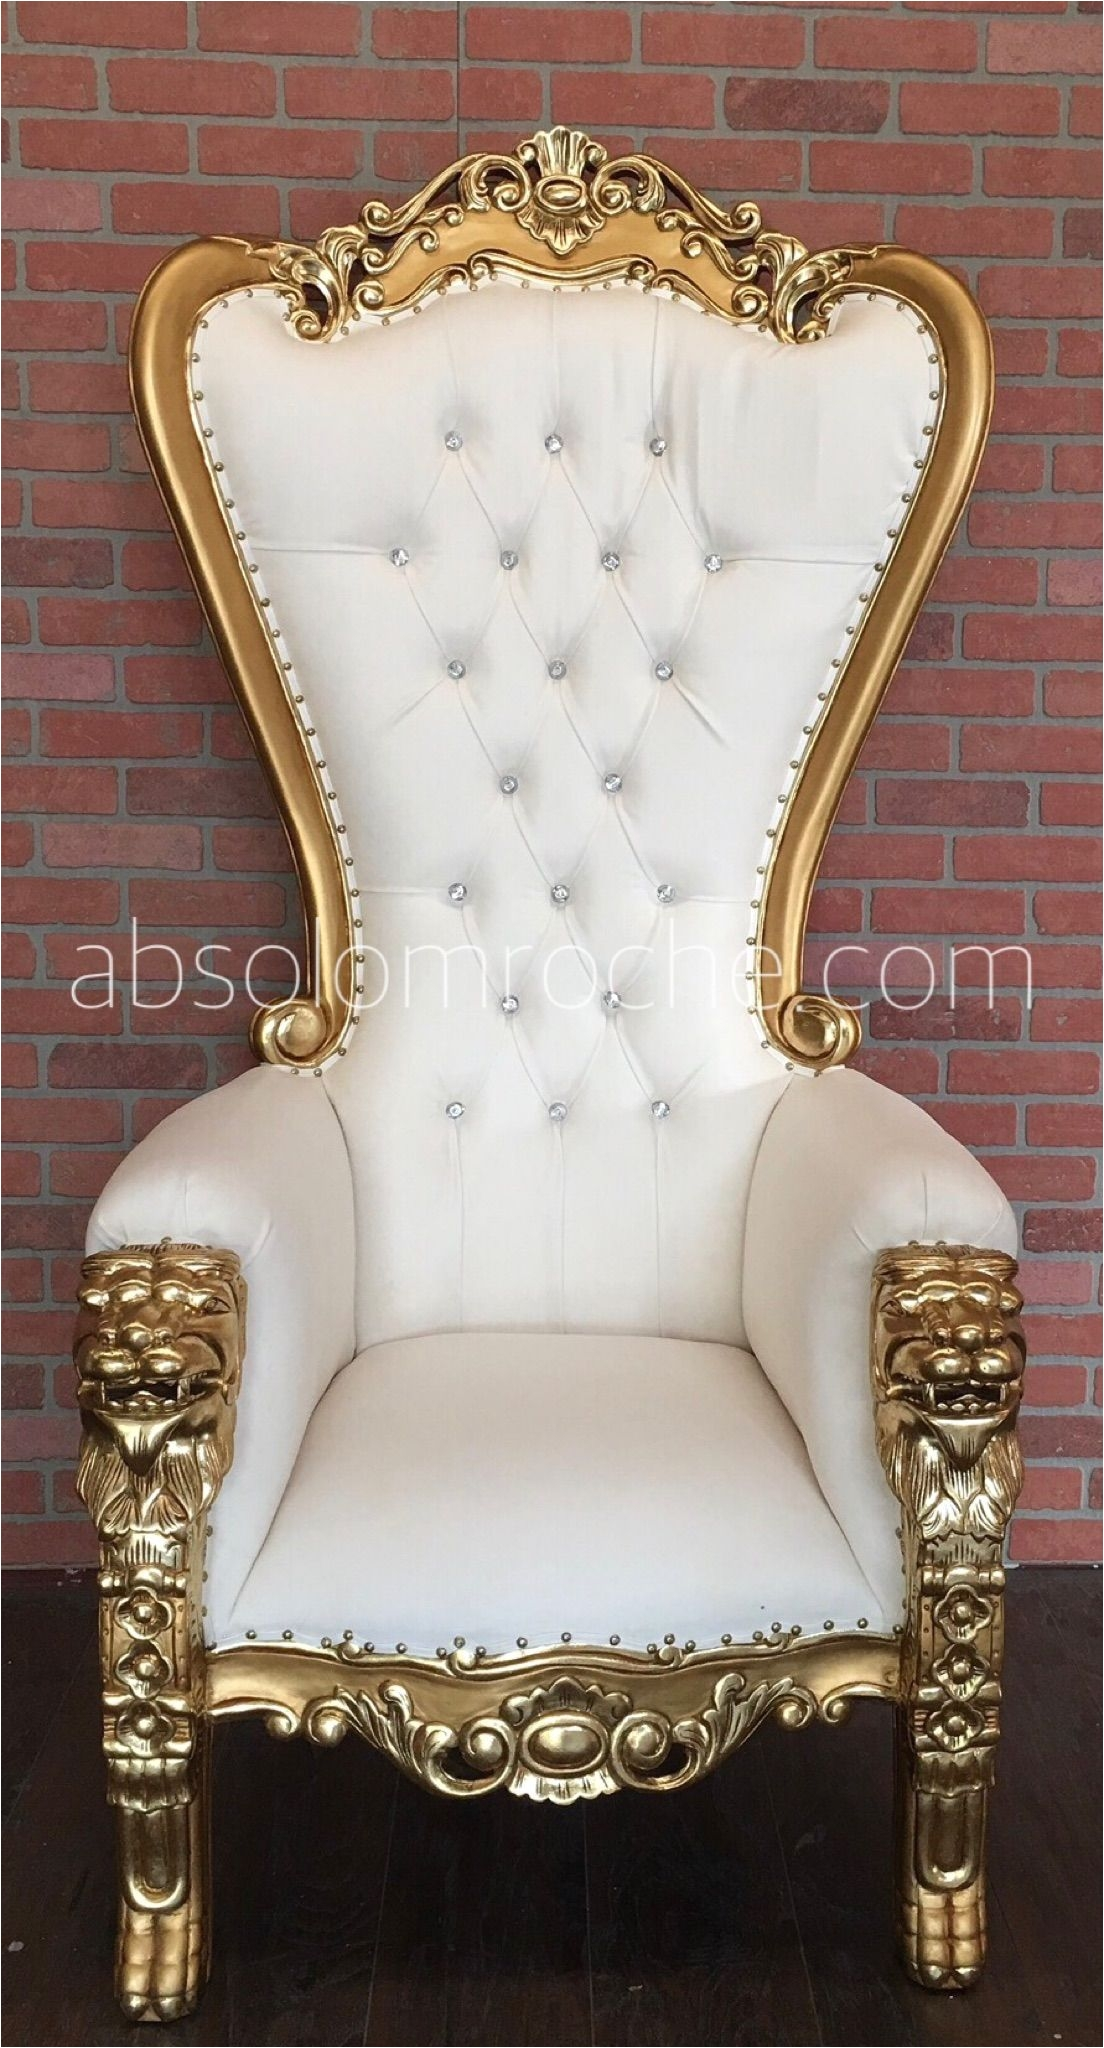 absolom roche lion throne chair gold white